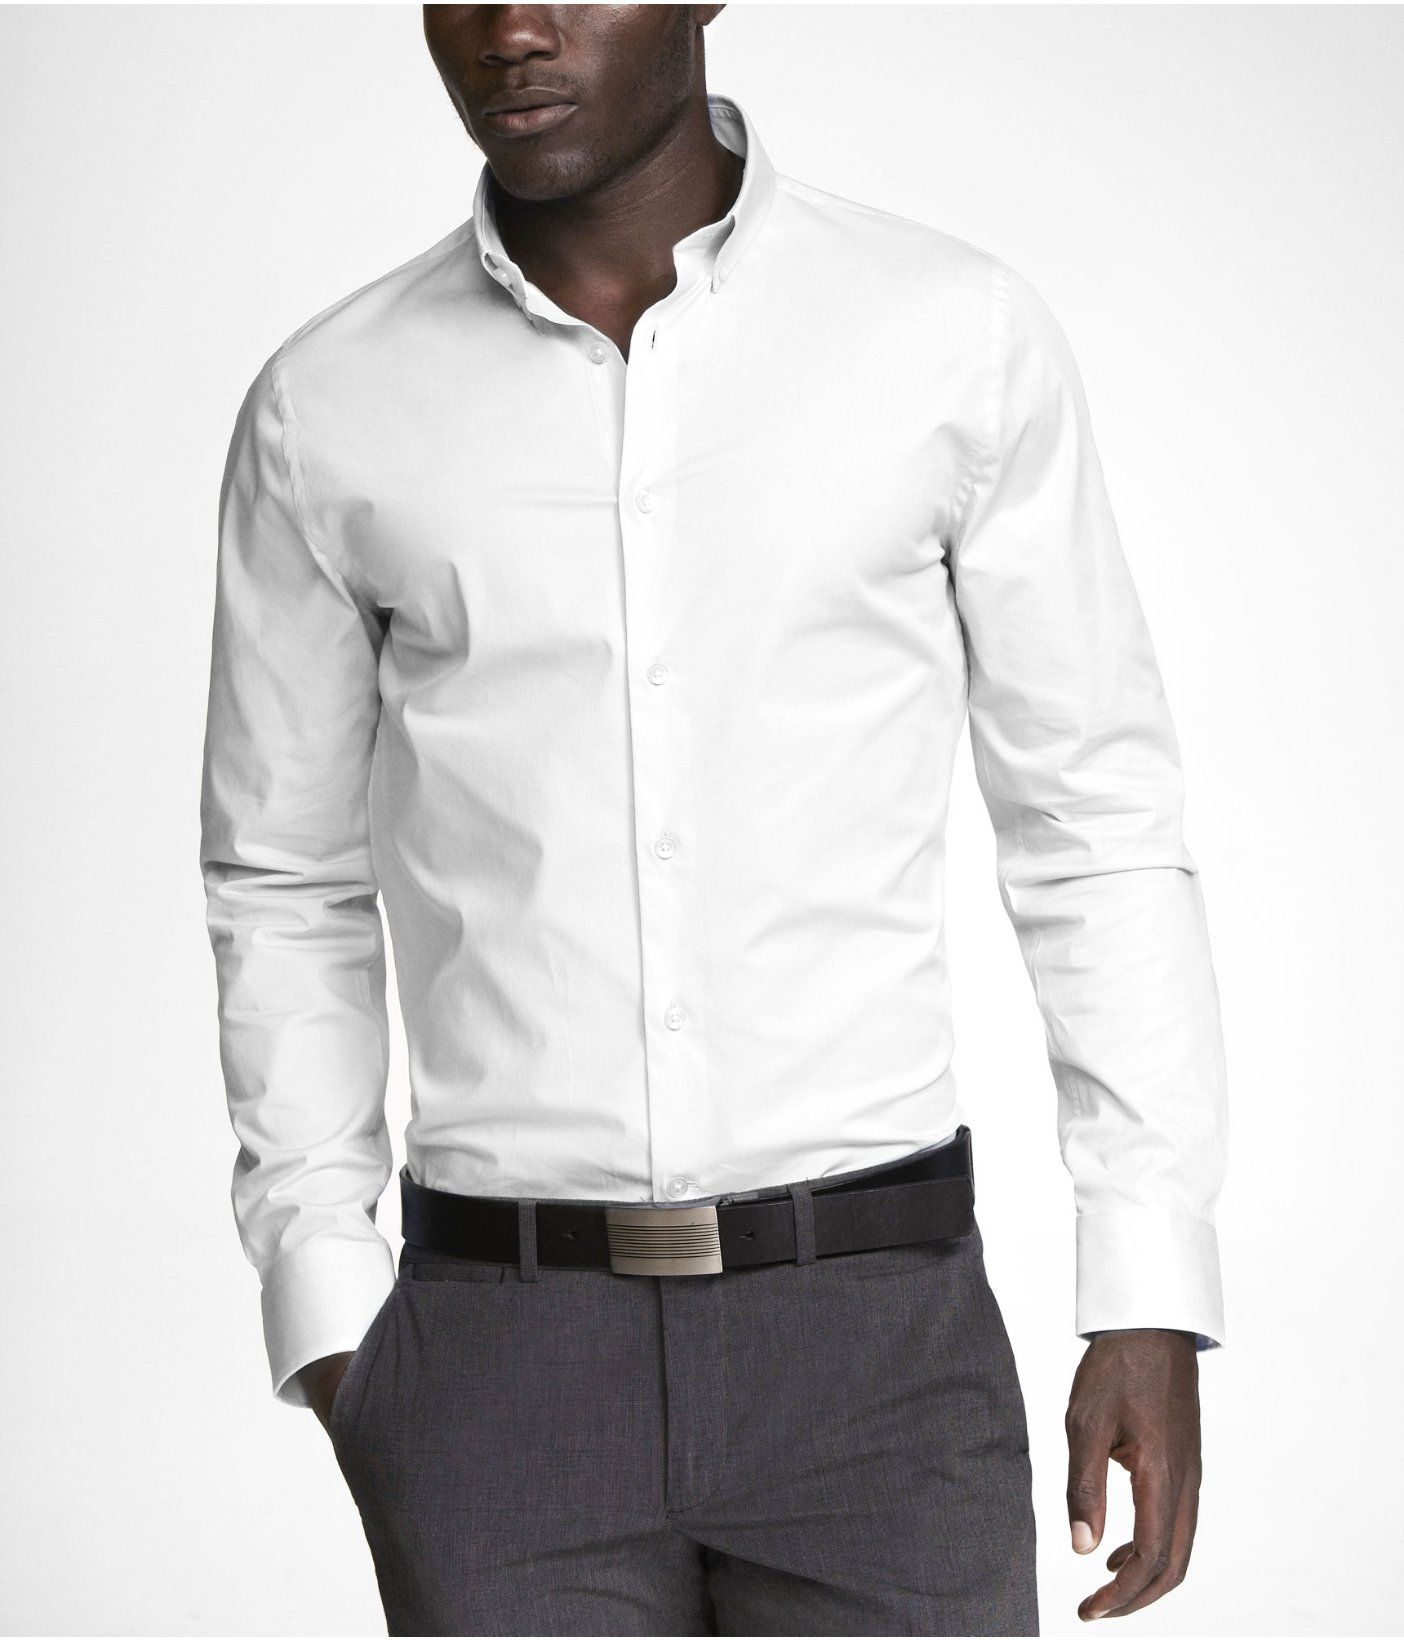 Extra Slim 1mx Button Down Collar Shirt Express Mens White Dress Shirt Mens Shirt Dress Mens Outfits [ 1640 x 1404 Pixel ]